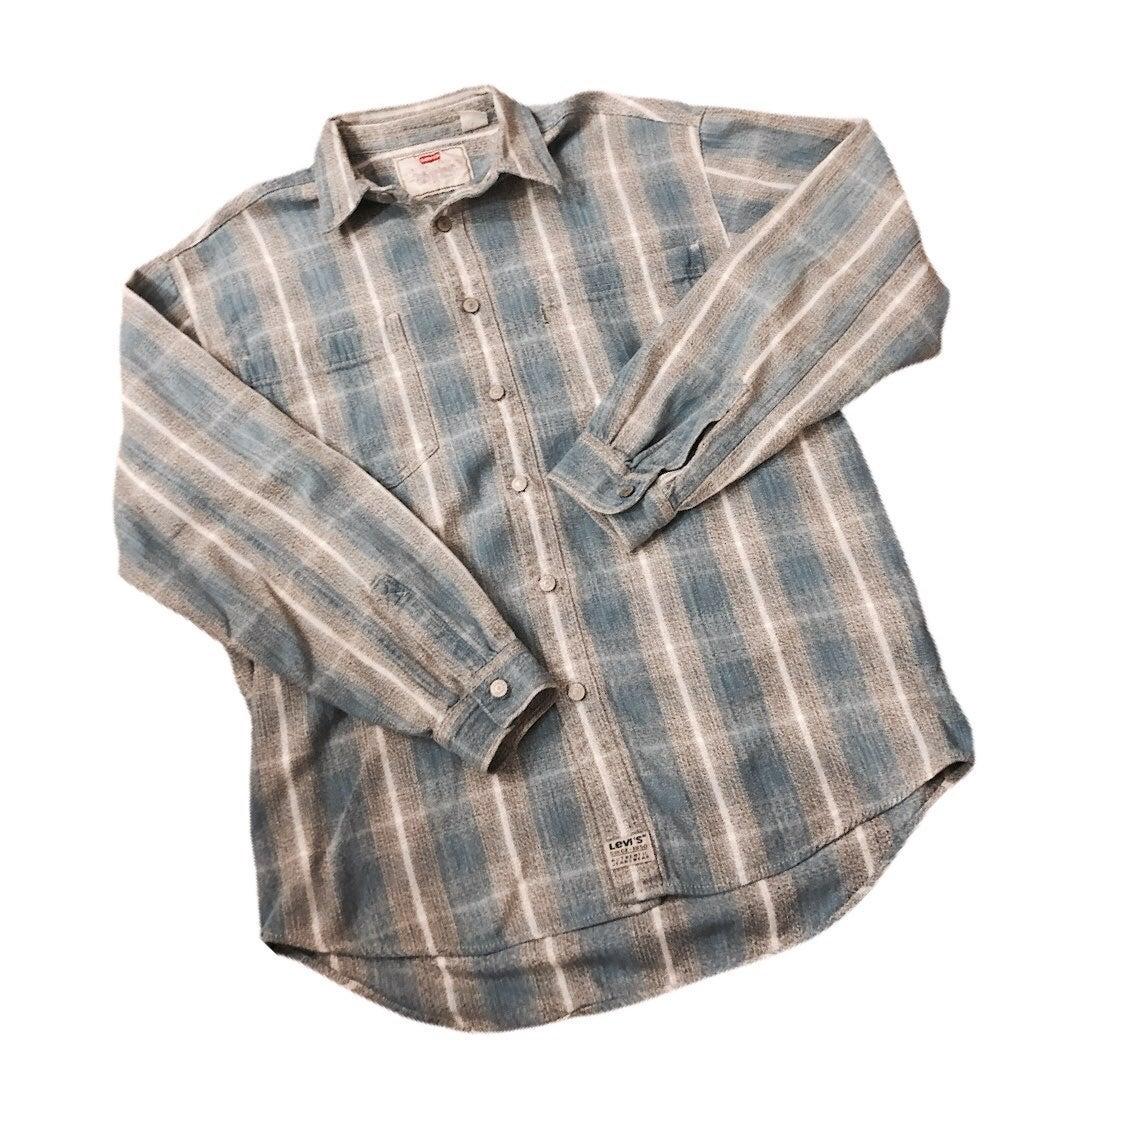 Vintage Levi Cotton Shirt Jacket unisex